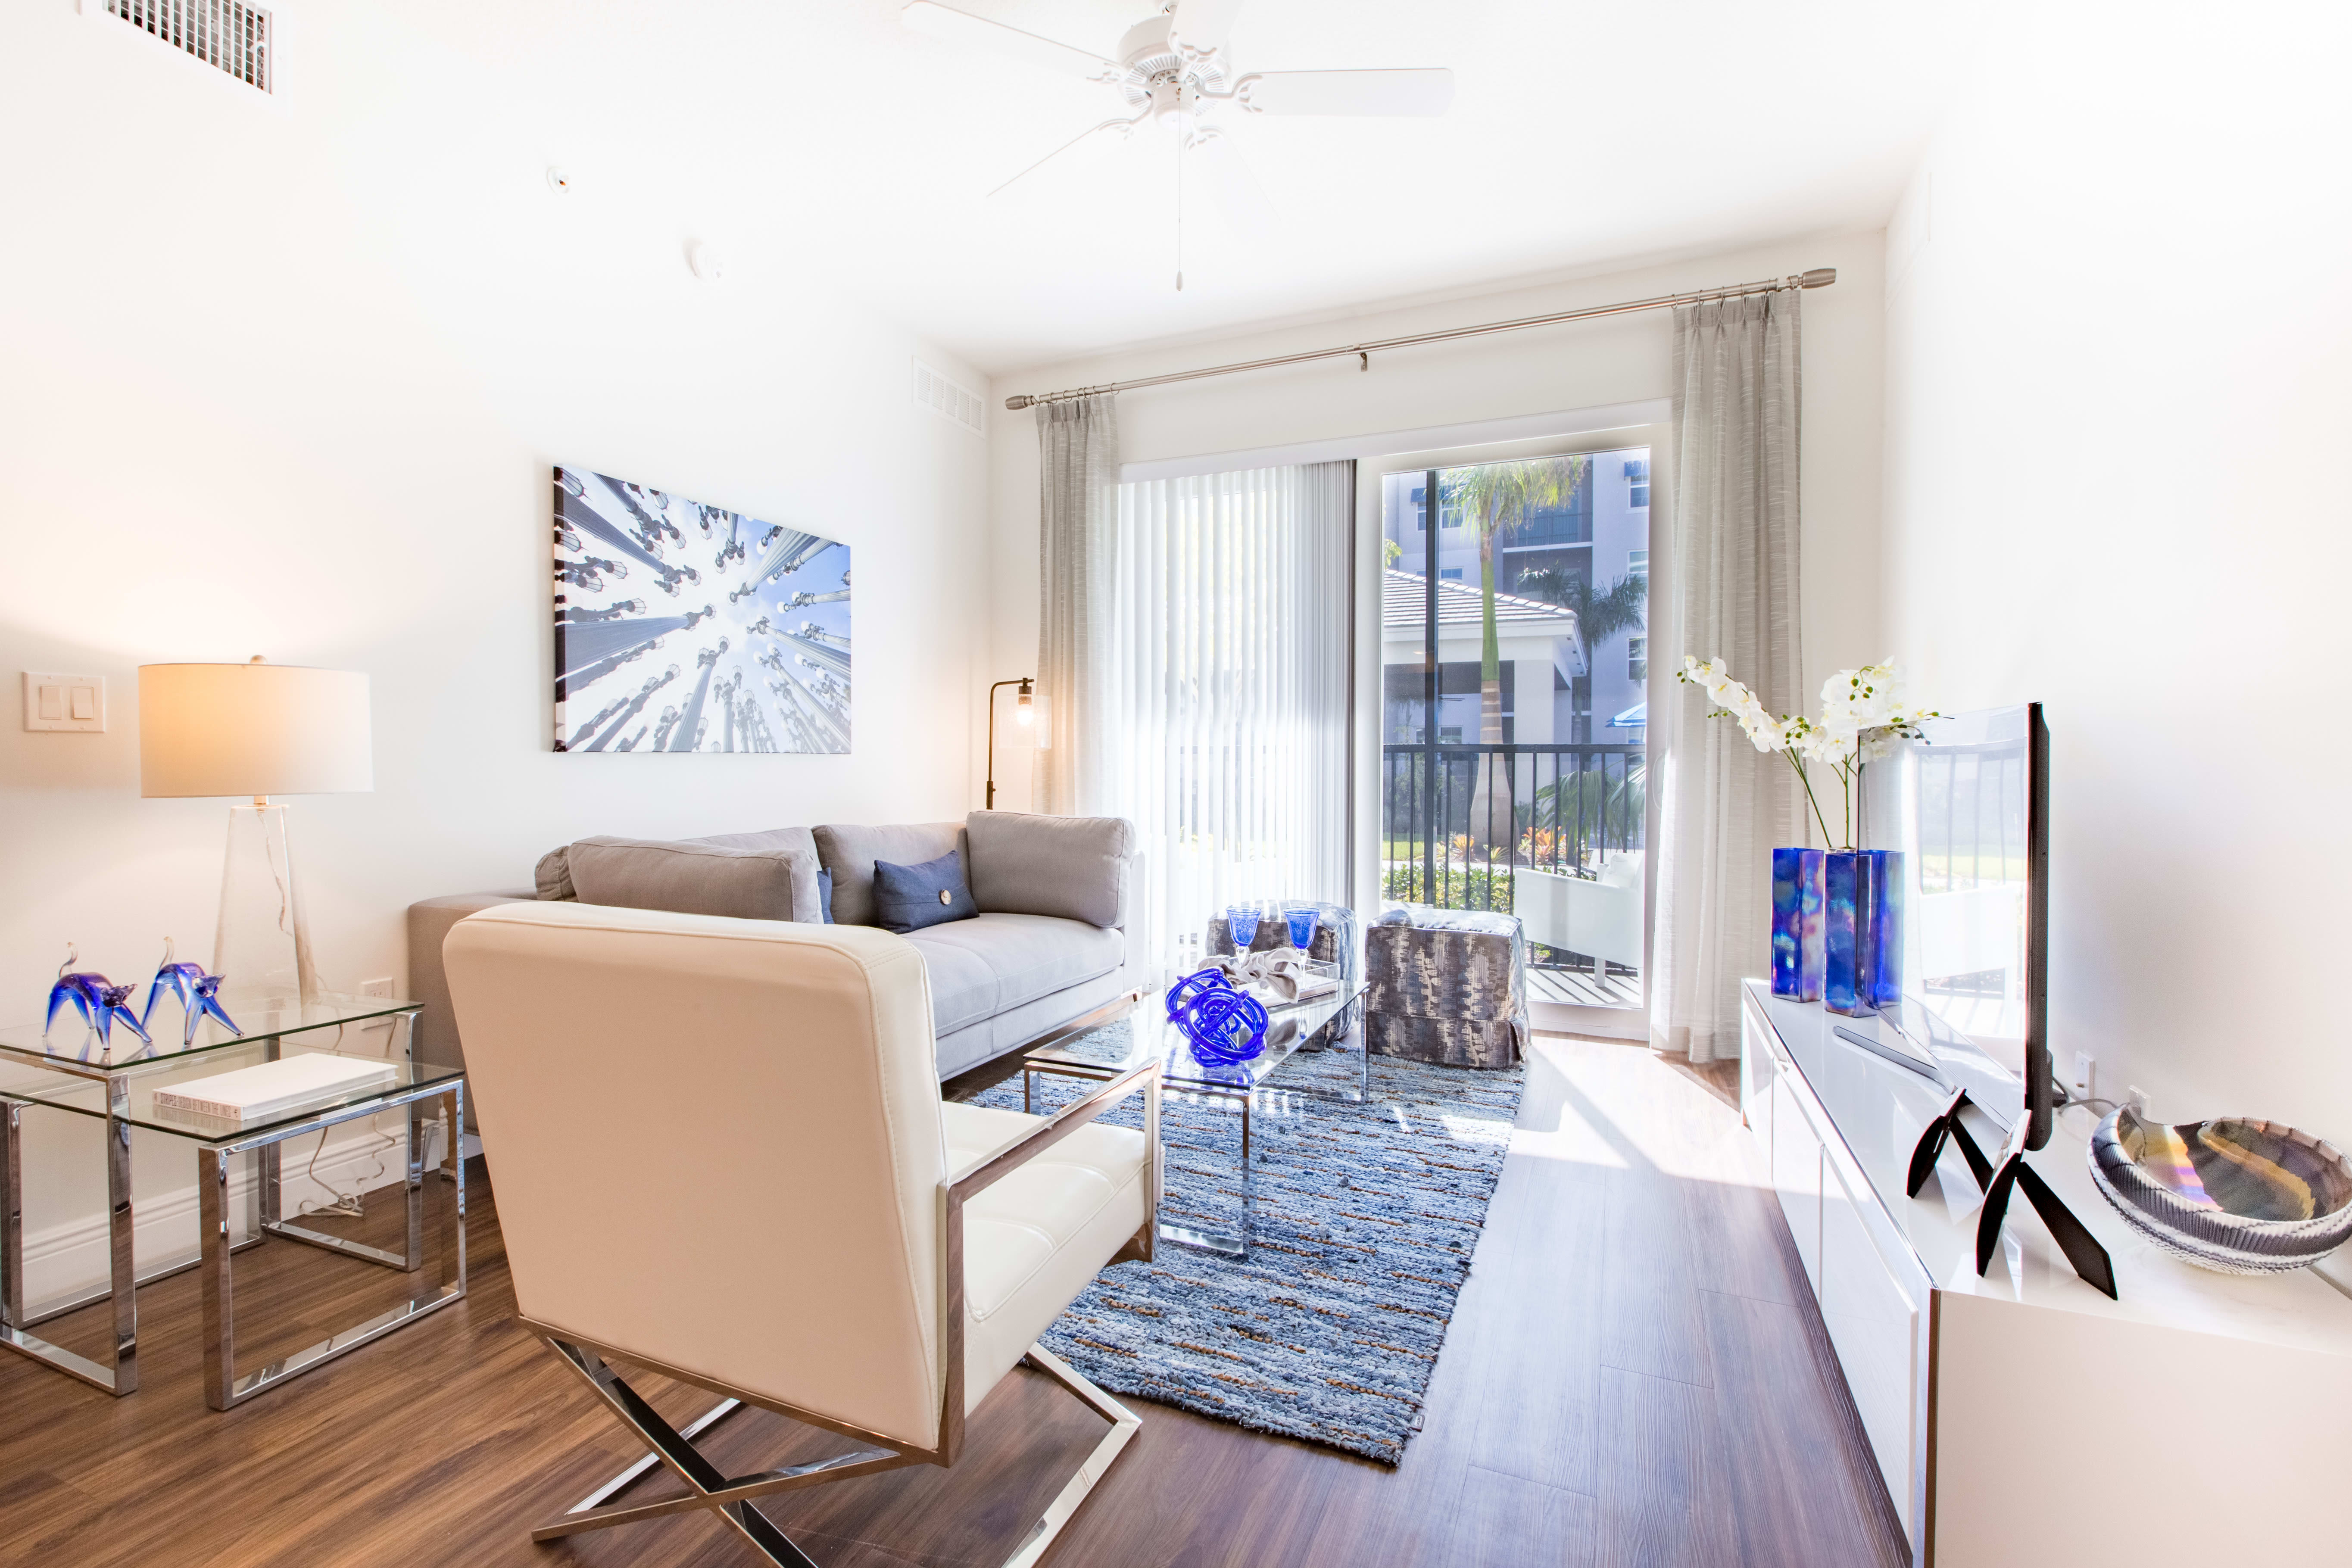 Apartments at Luma at Miramar in Miramar, Florida